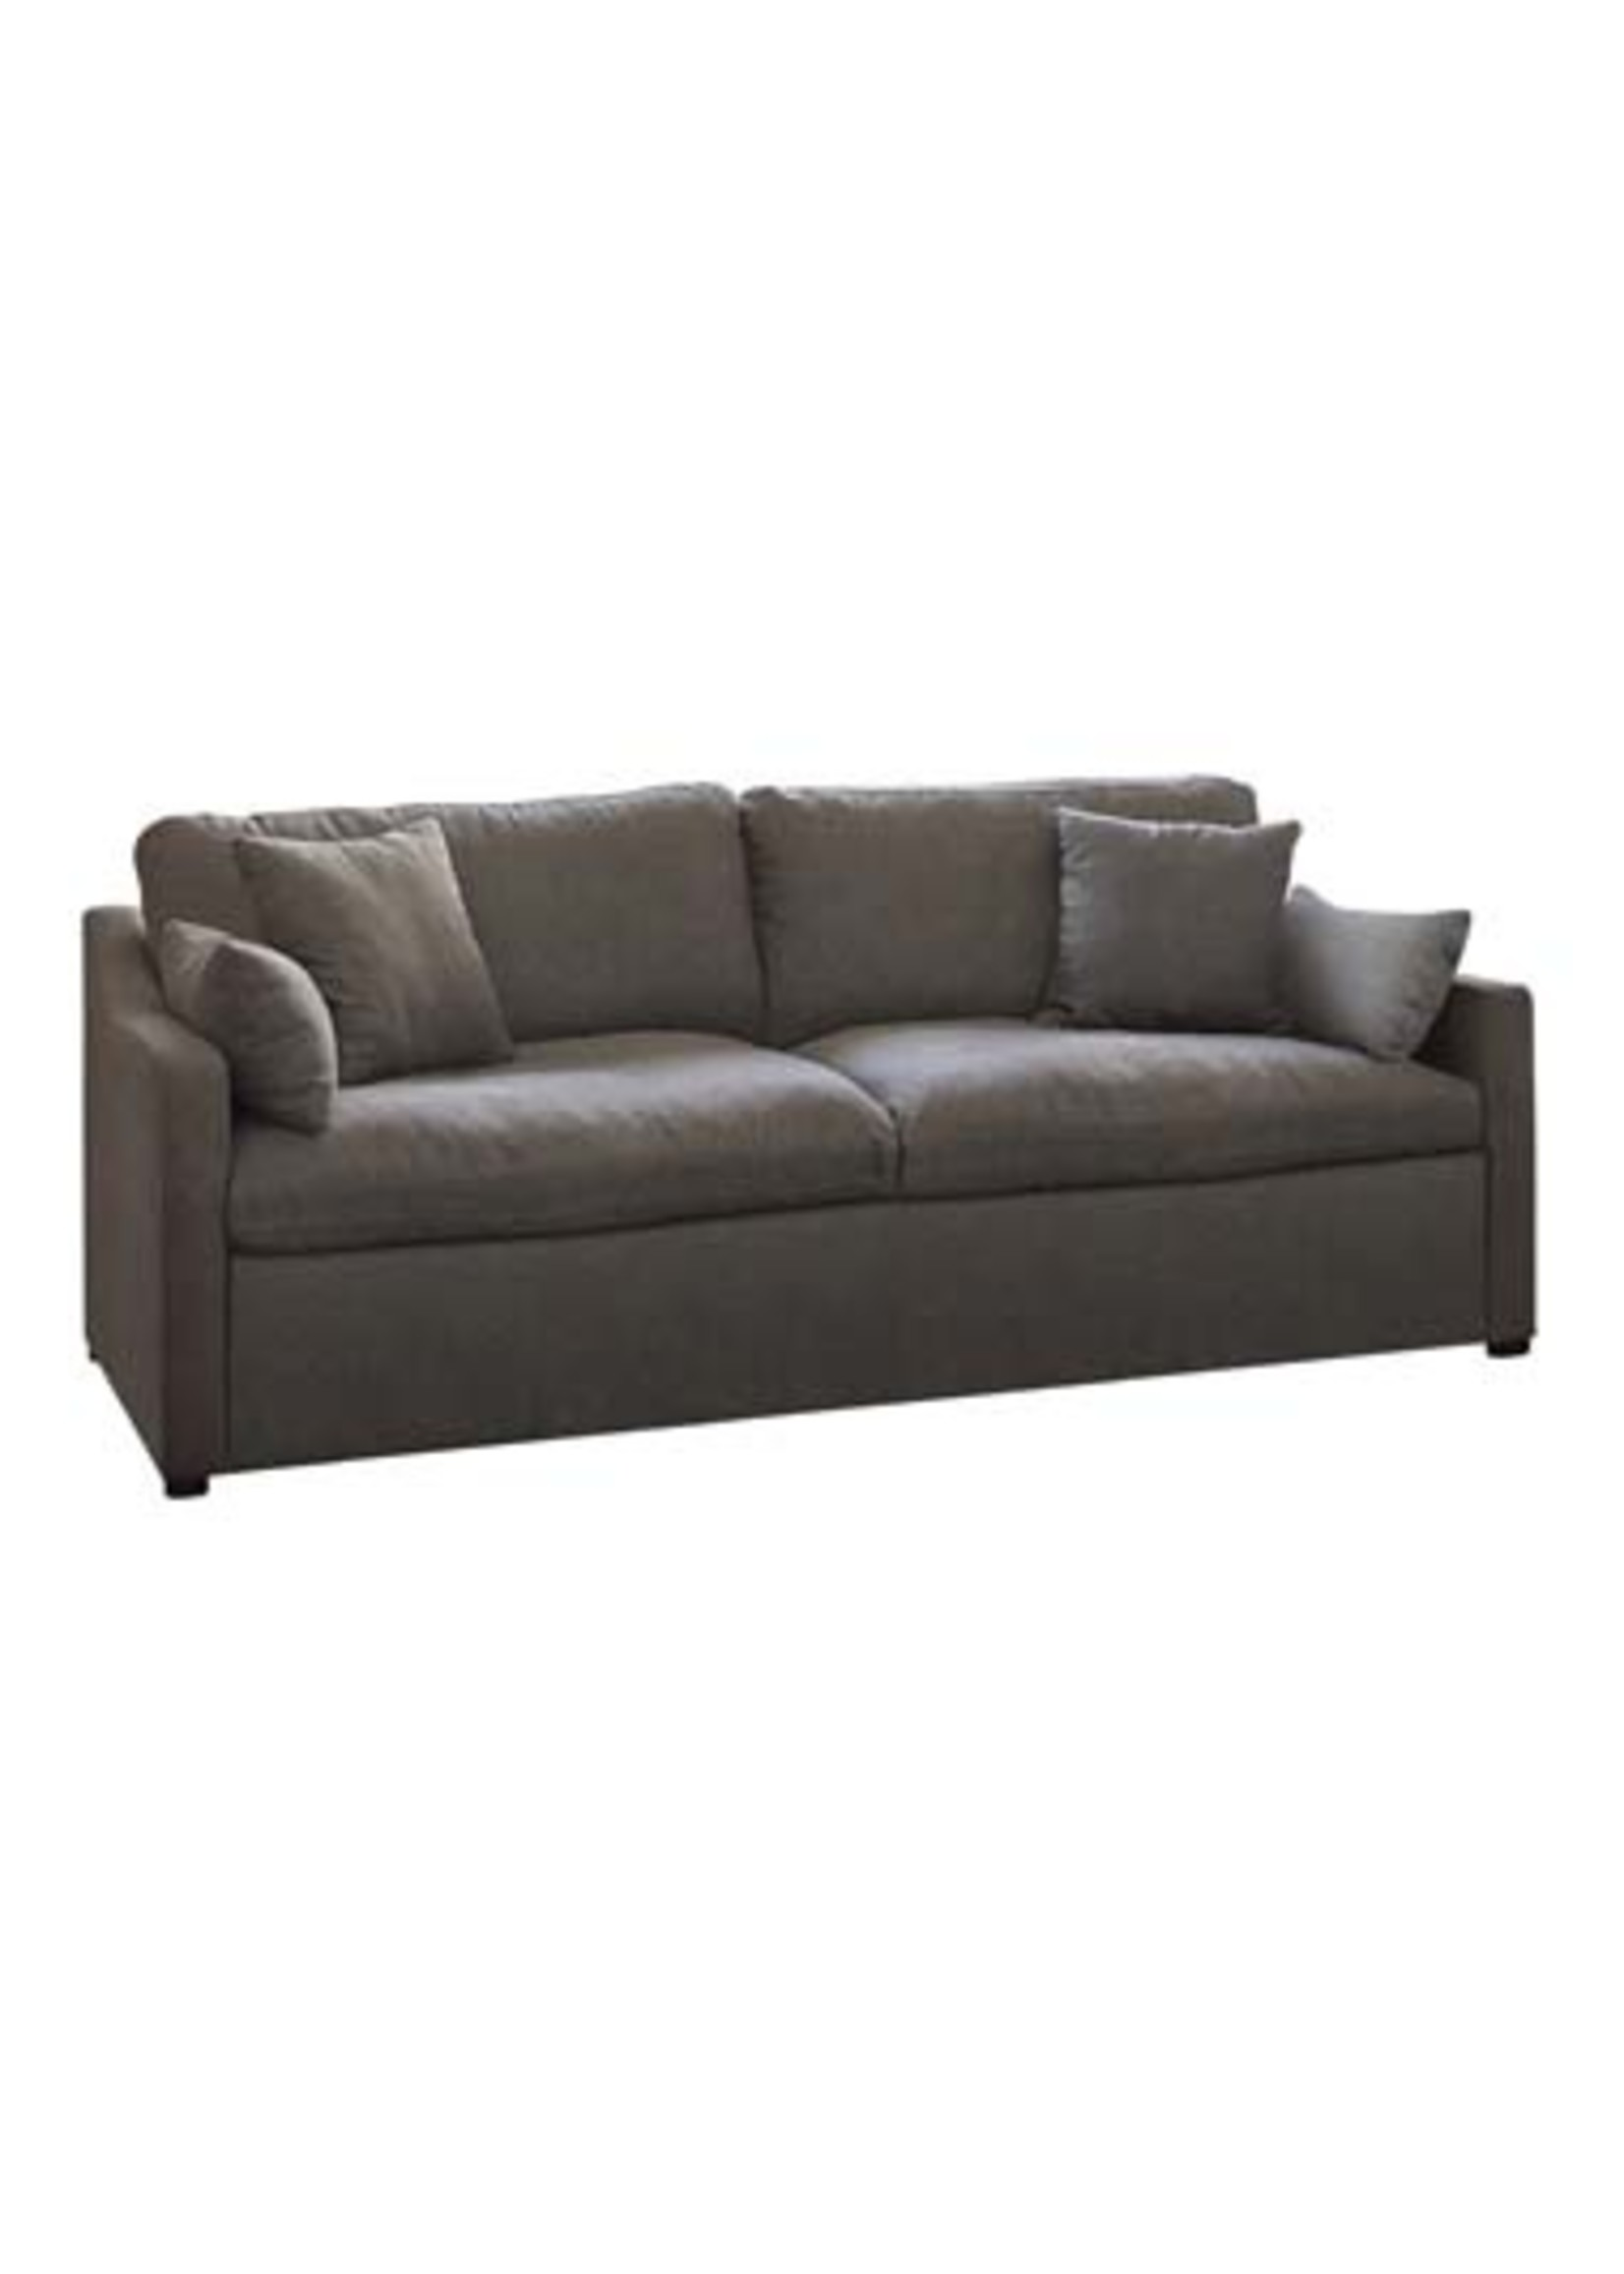 Coaster Furniture COASTER Sofa Charcoal Gray